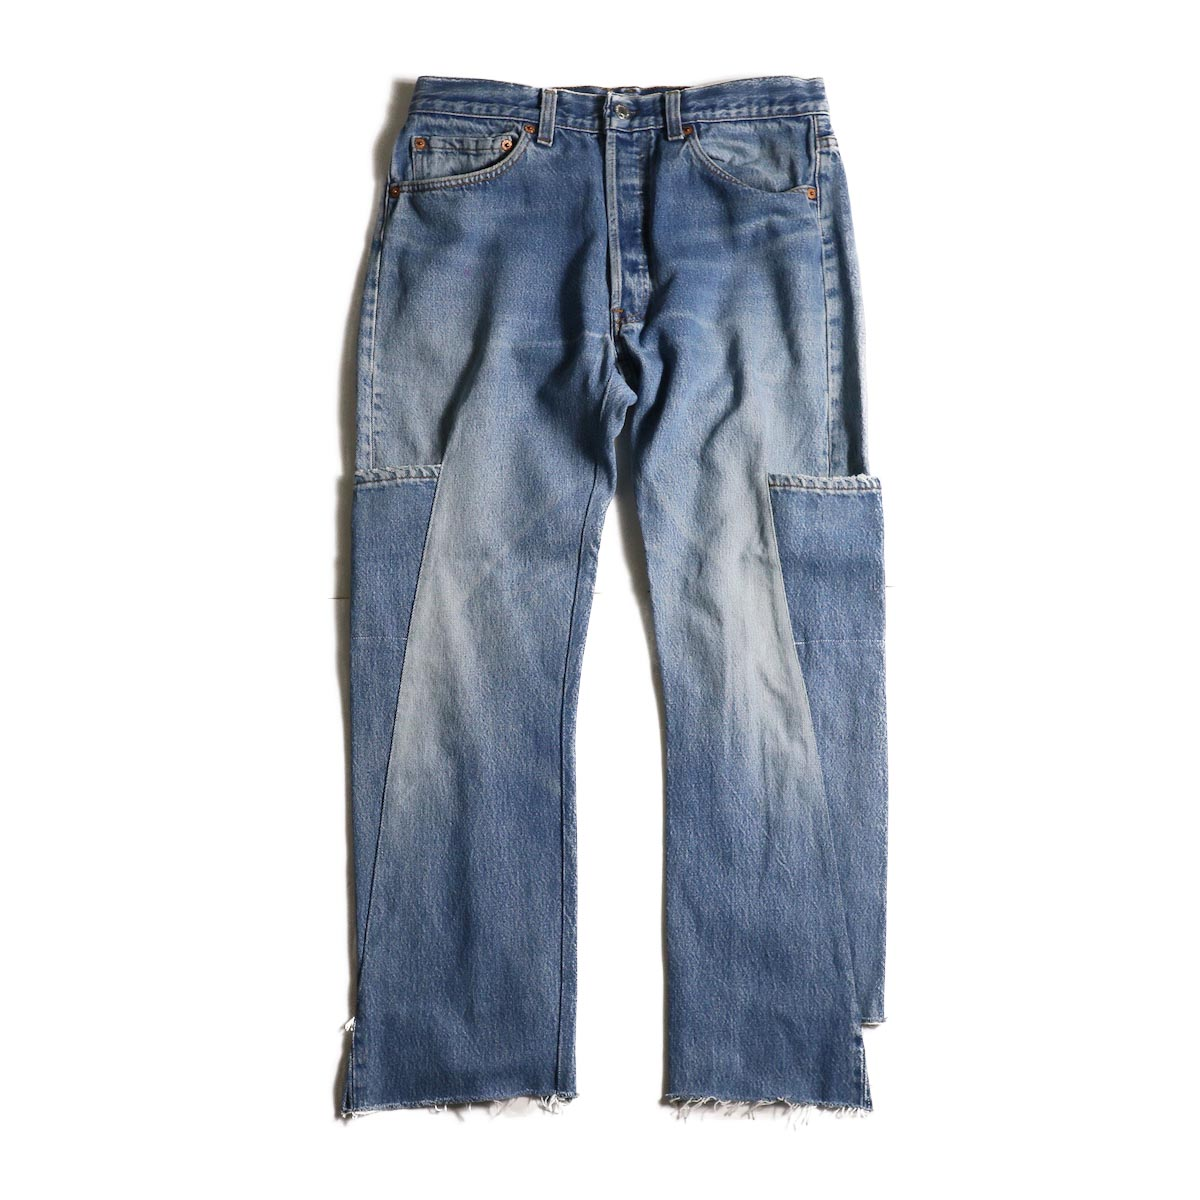 OLD PARK / 7Pocket Jeans -Blue (Msize-A)